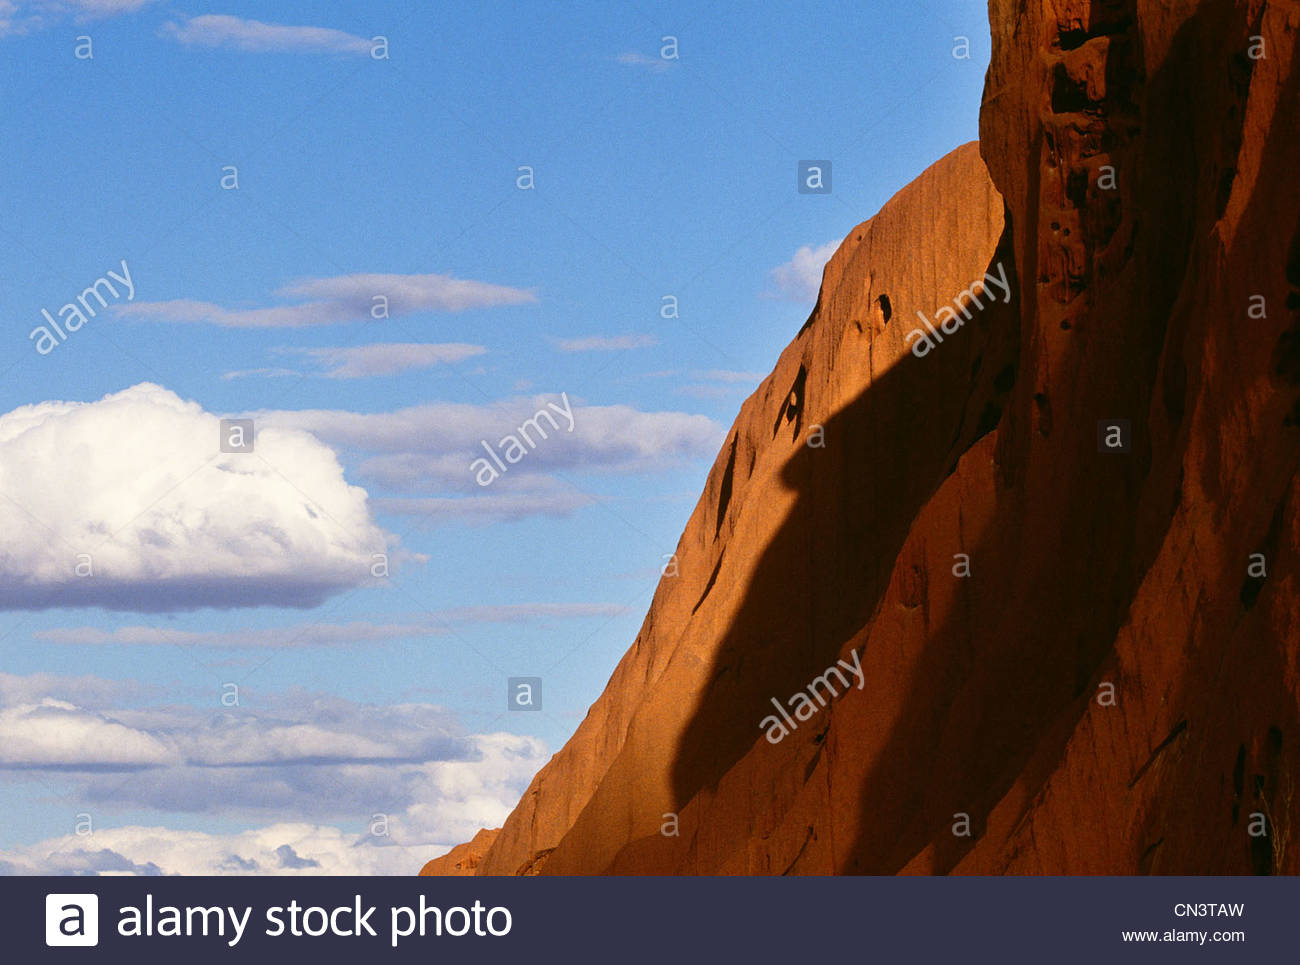 Ayers Rock, Uluru-Kata Tjuta National Park, Australia - Stock Image